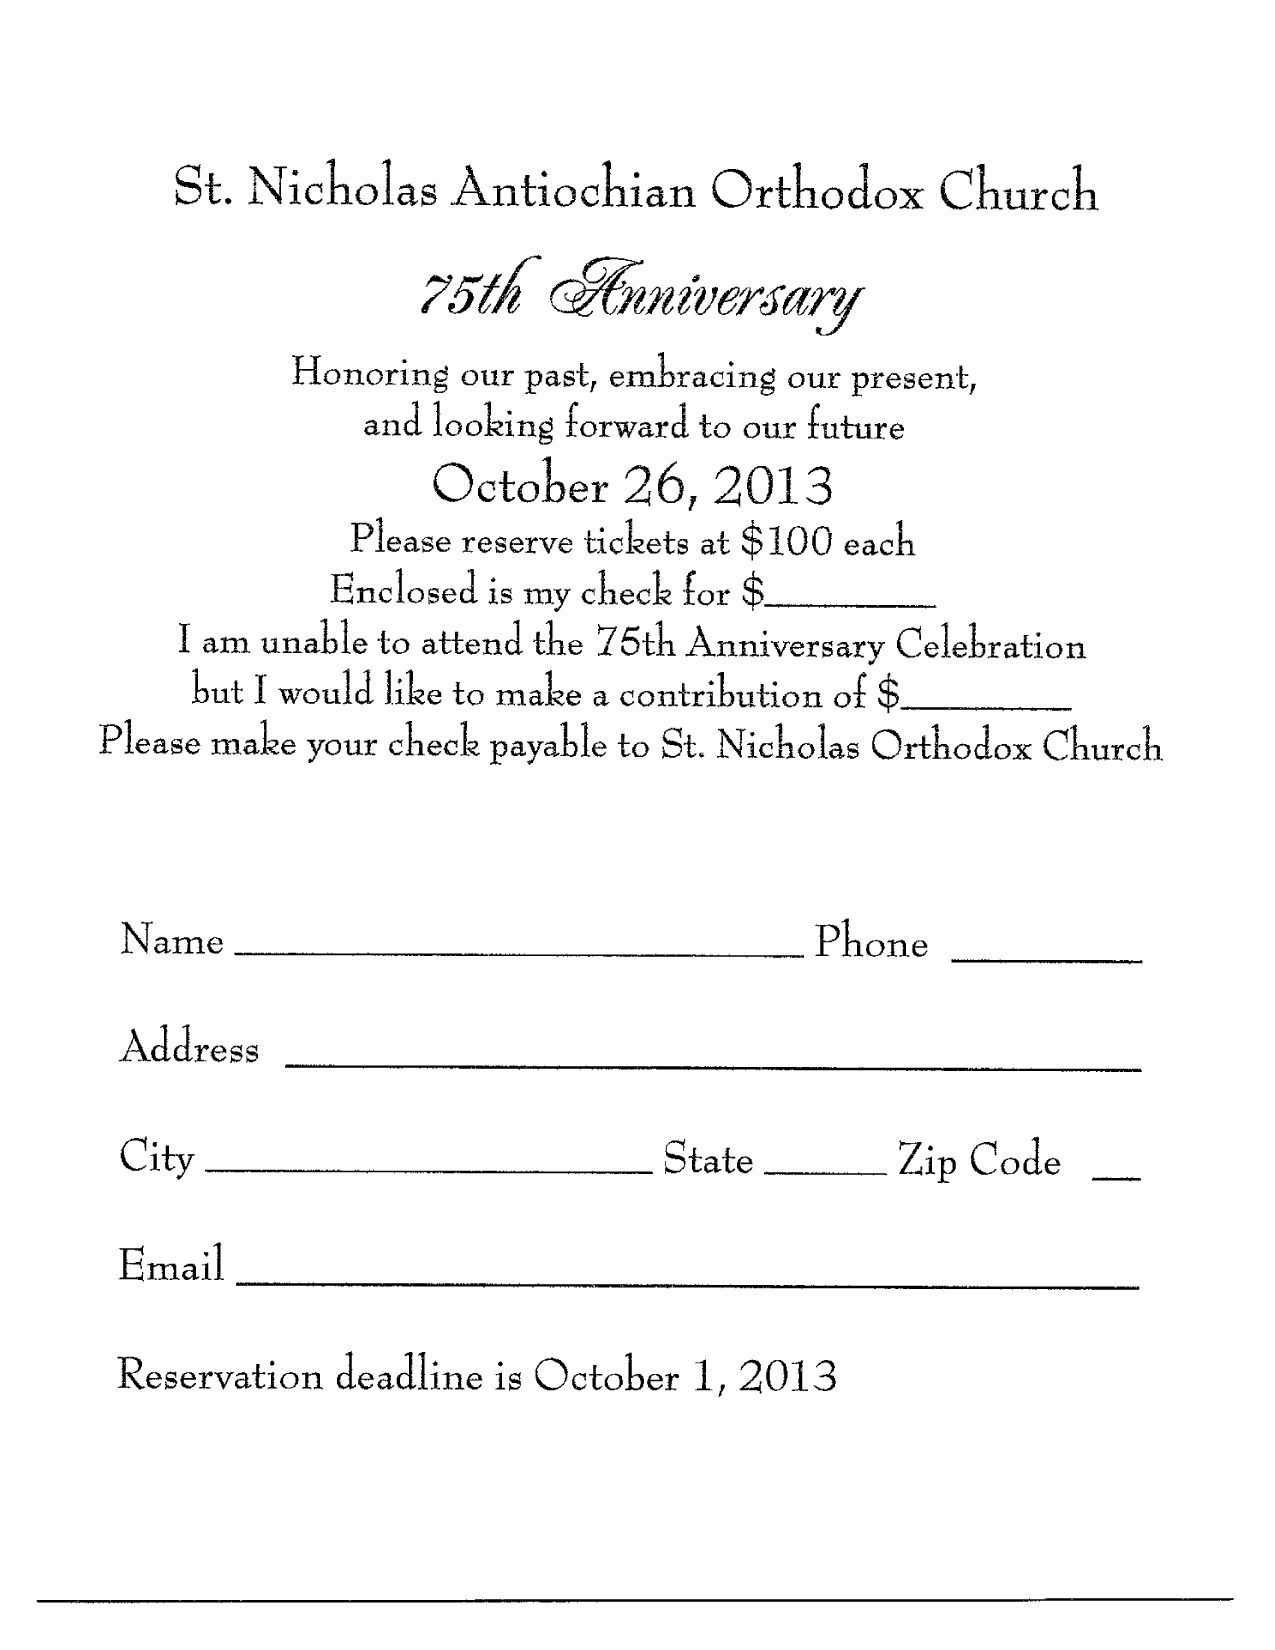 Image Result For Church Anniversary Invitation Graduation Invitations Template Anniversary Invitations Graduation Party Invitations Templates